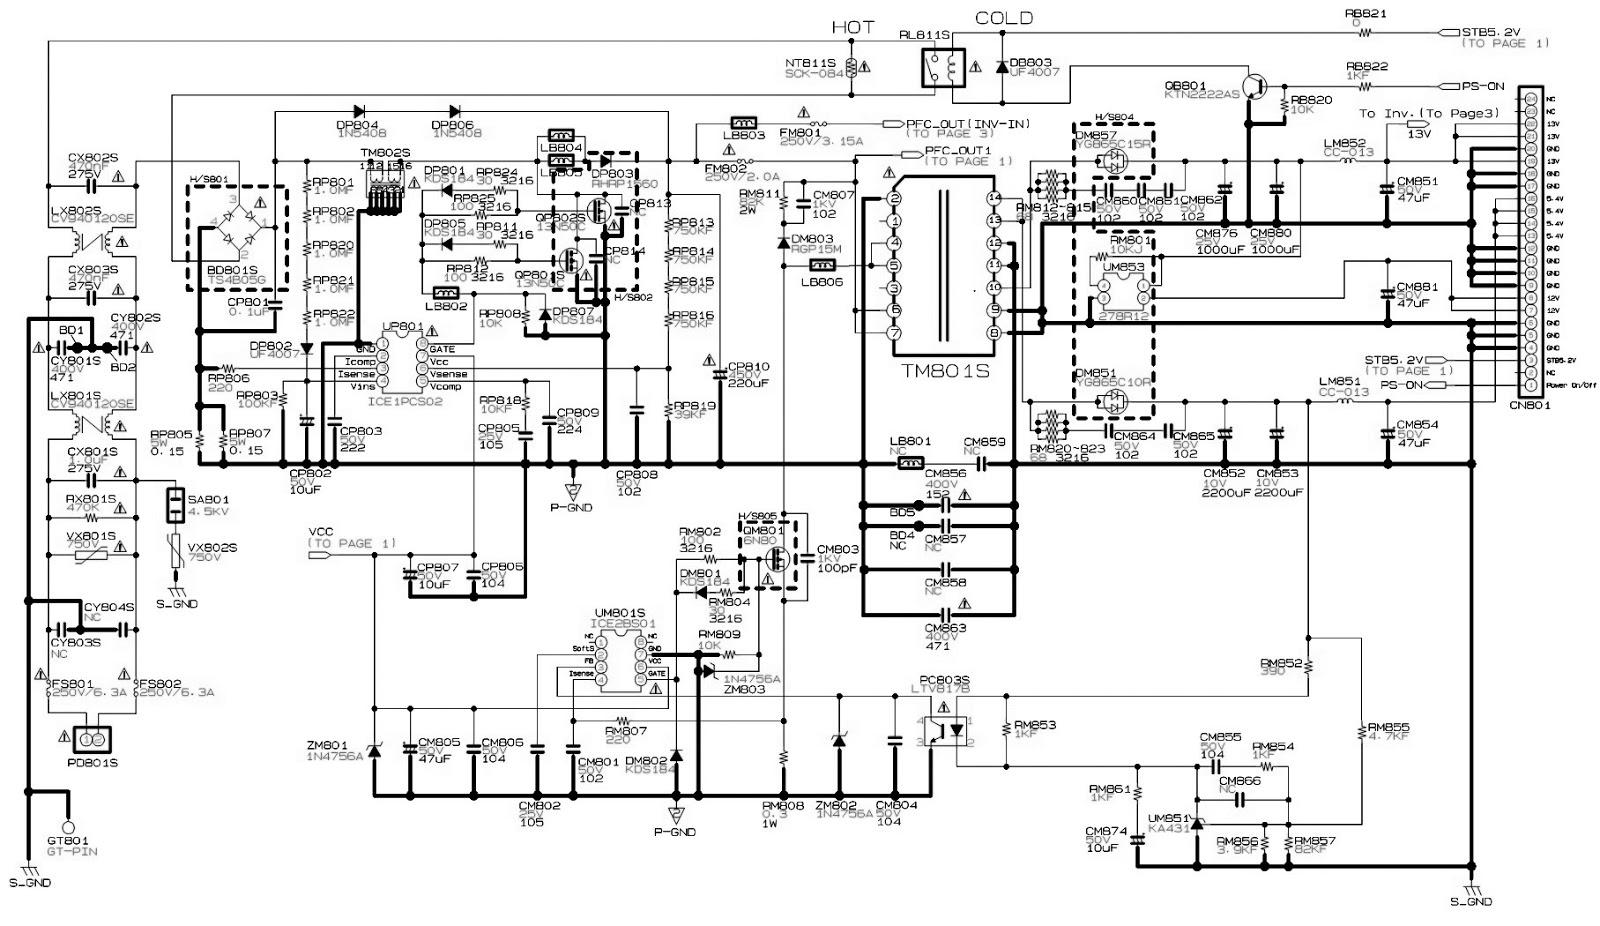 Parts Diagram Honda Ridgeline Free Image About Wiring Diagram And